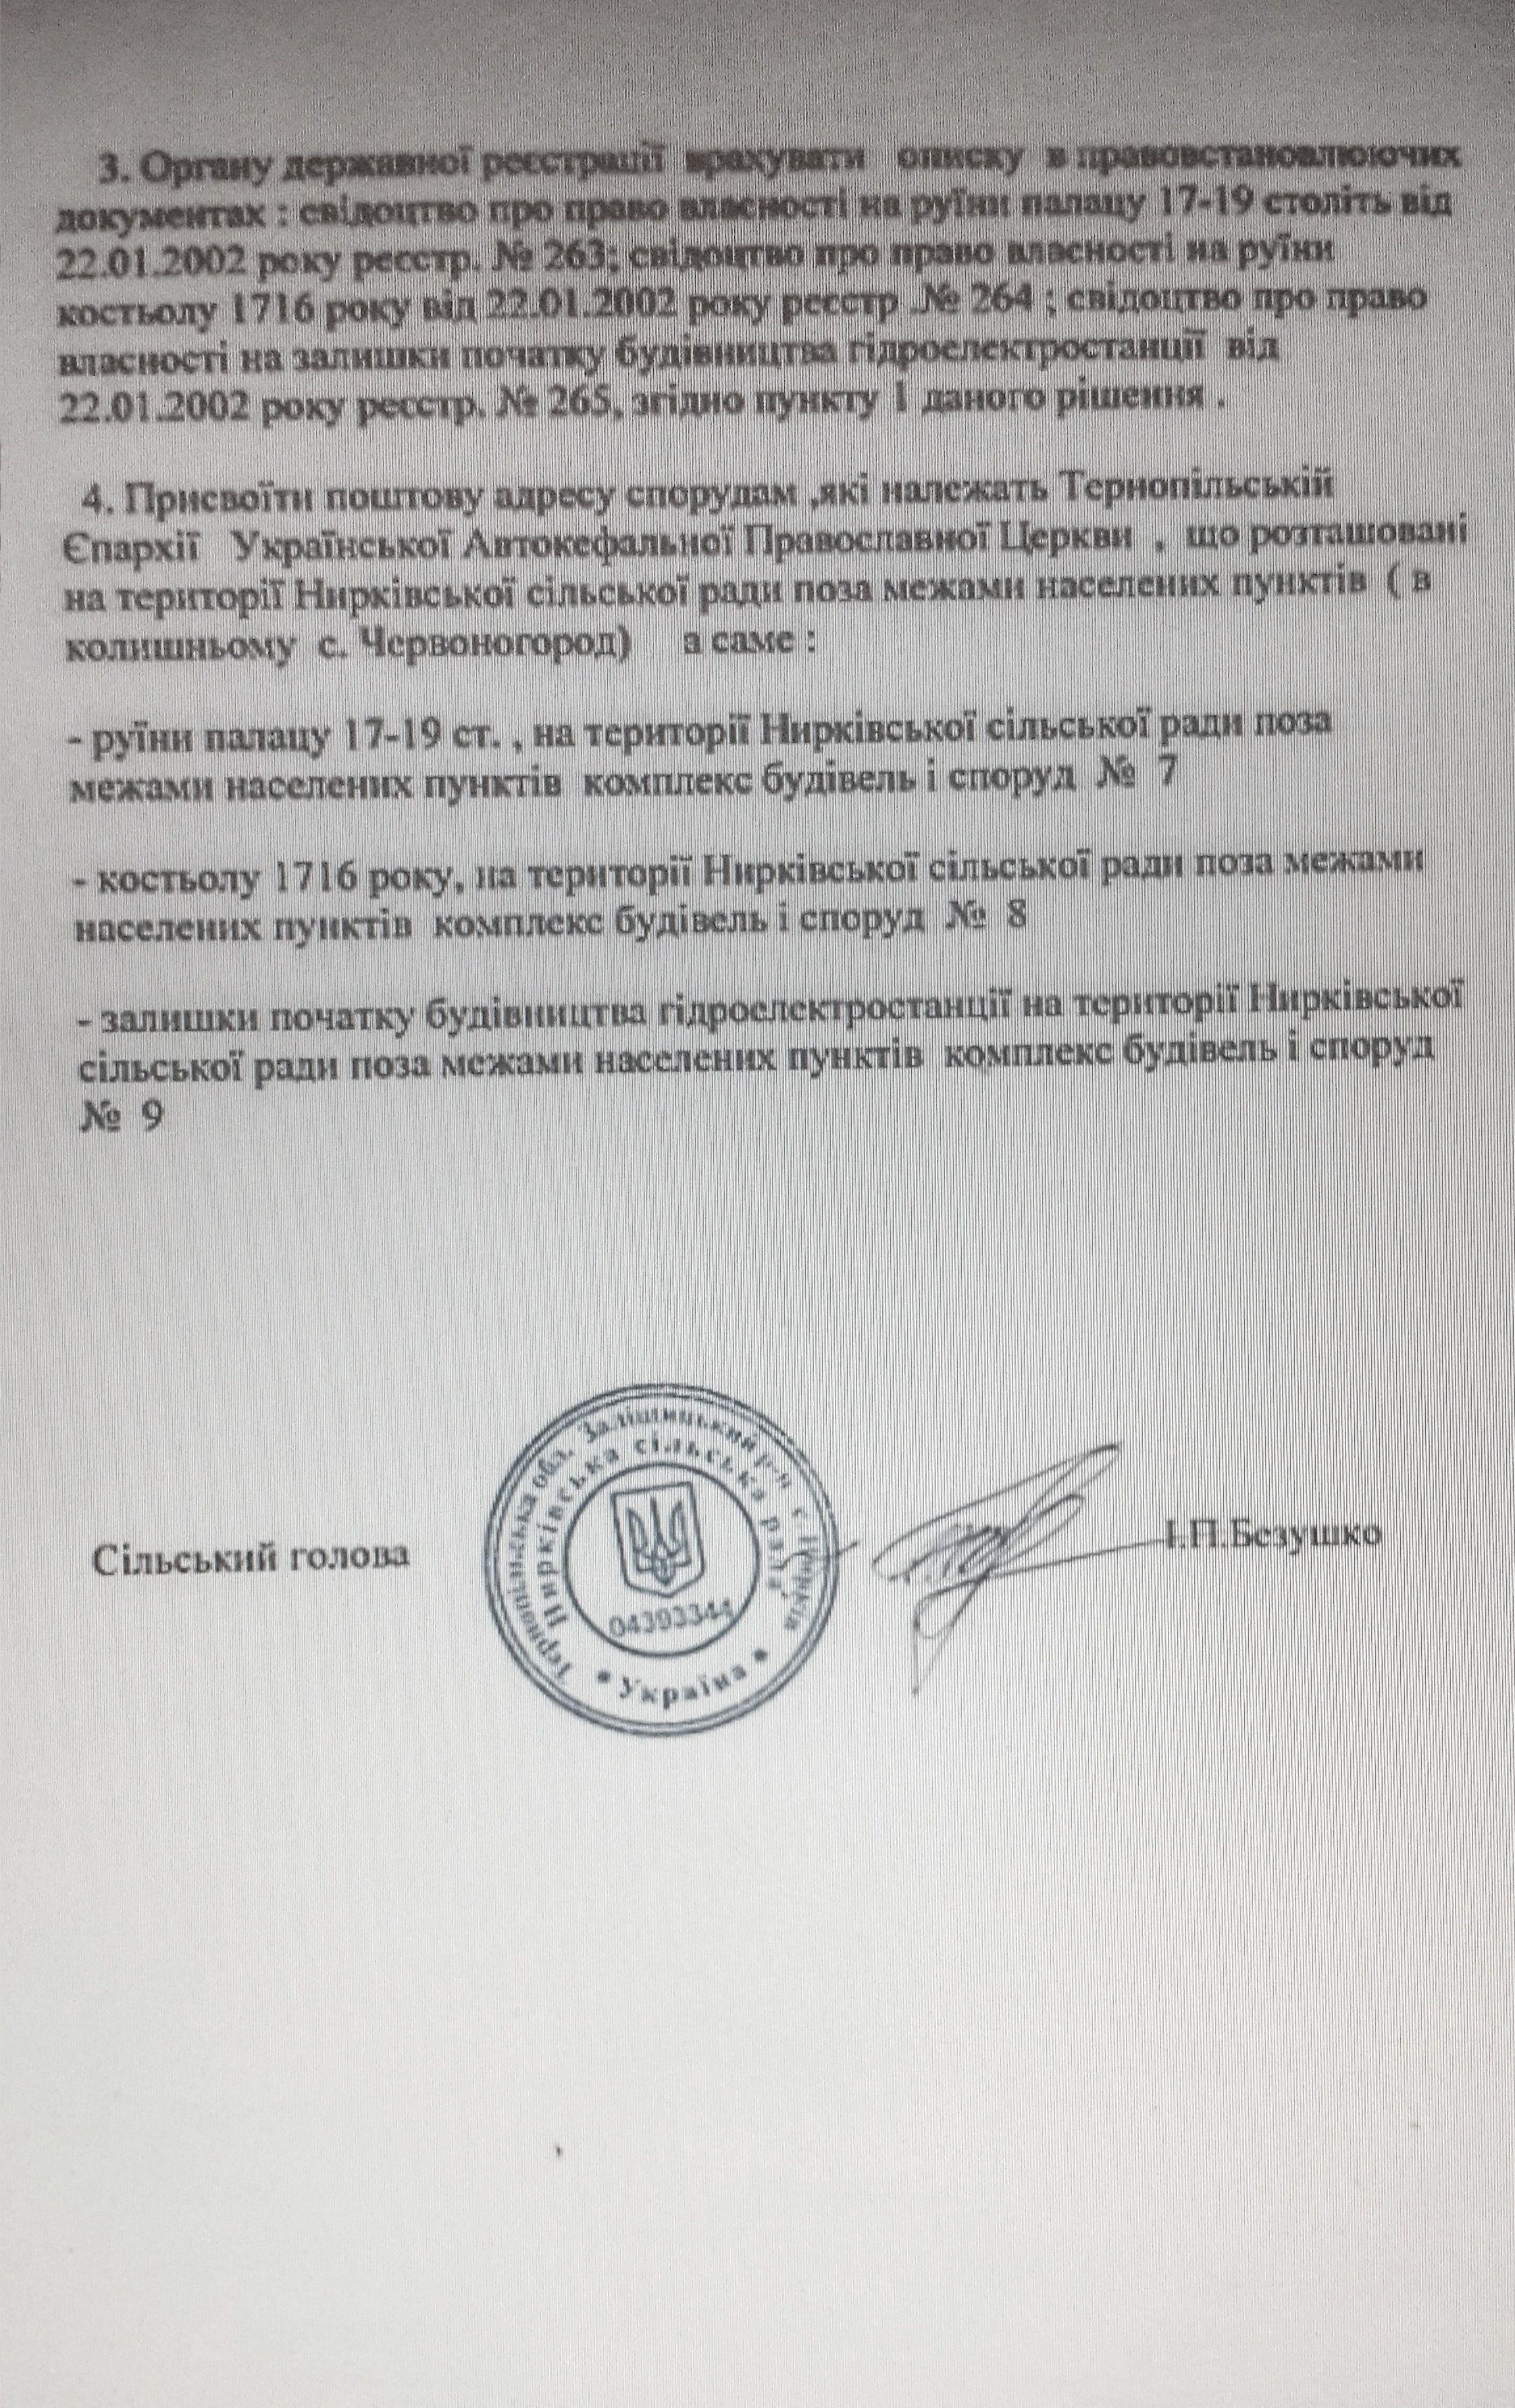 Документи по священику Мстиславу_8